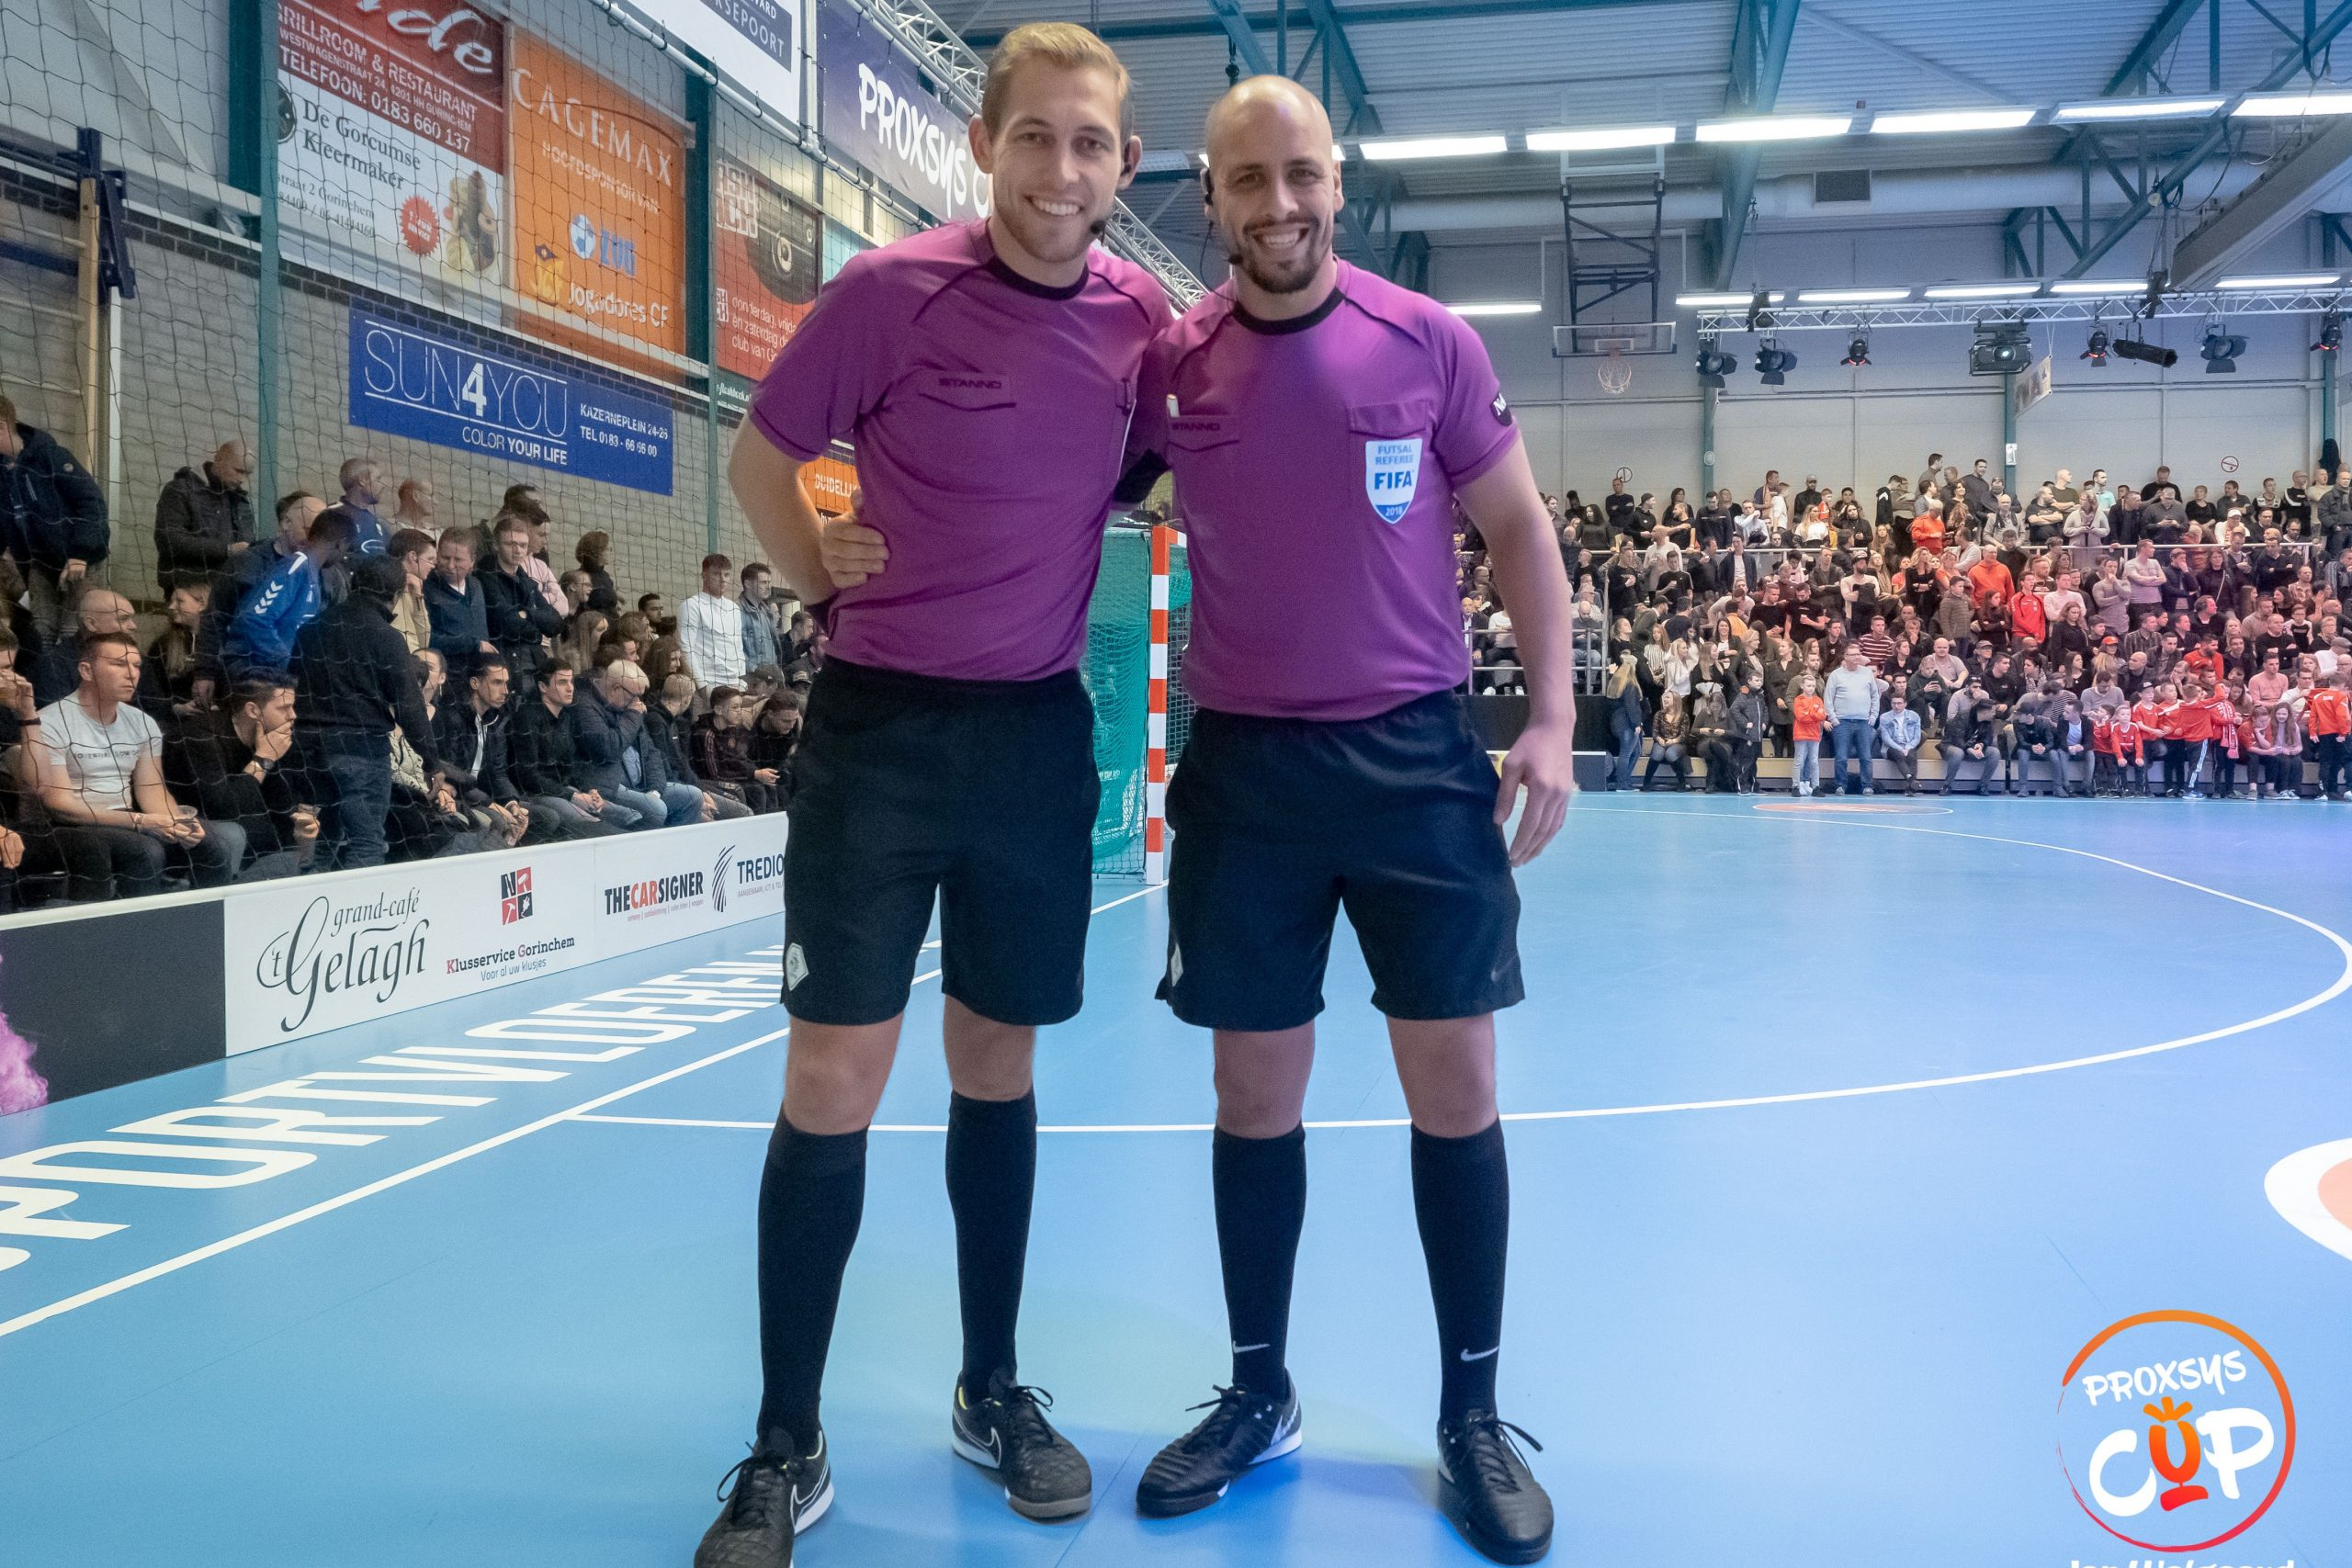 football-referee-headsets-futsal